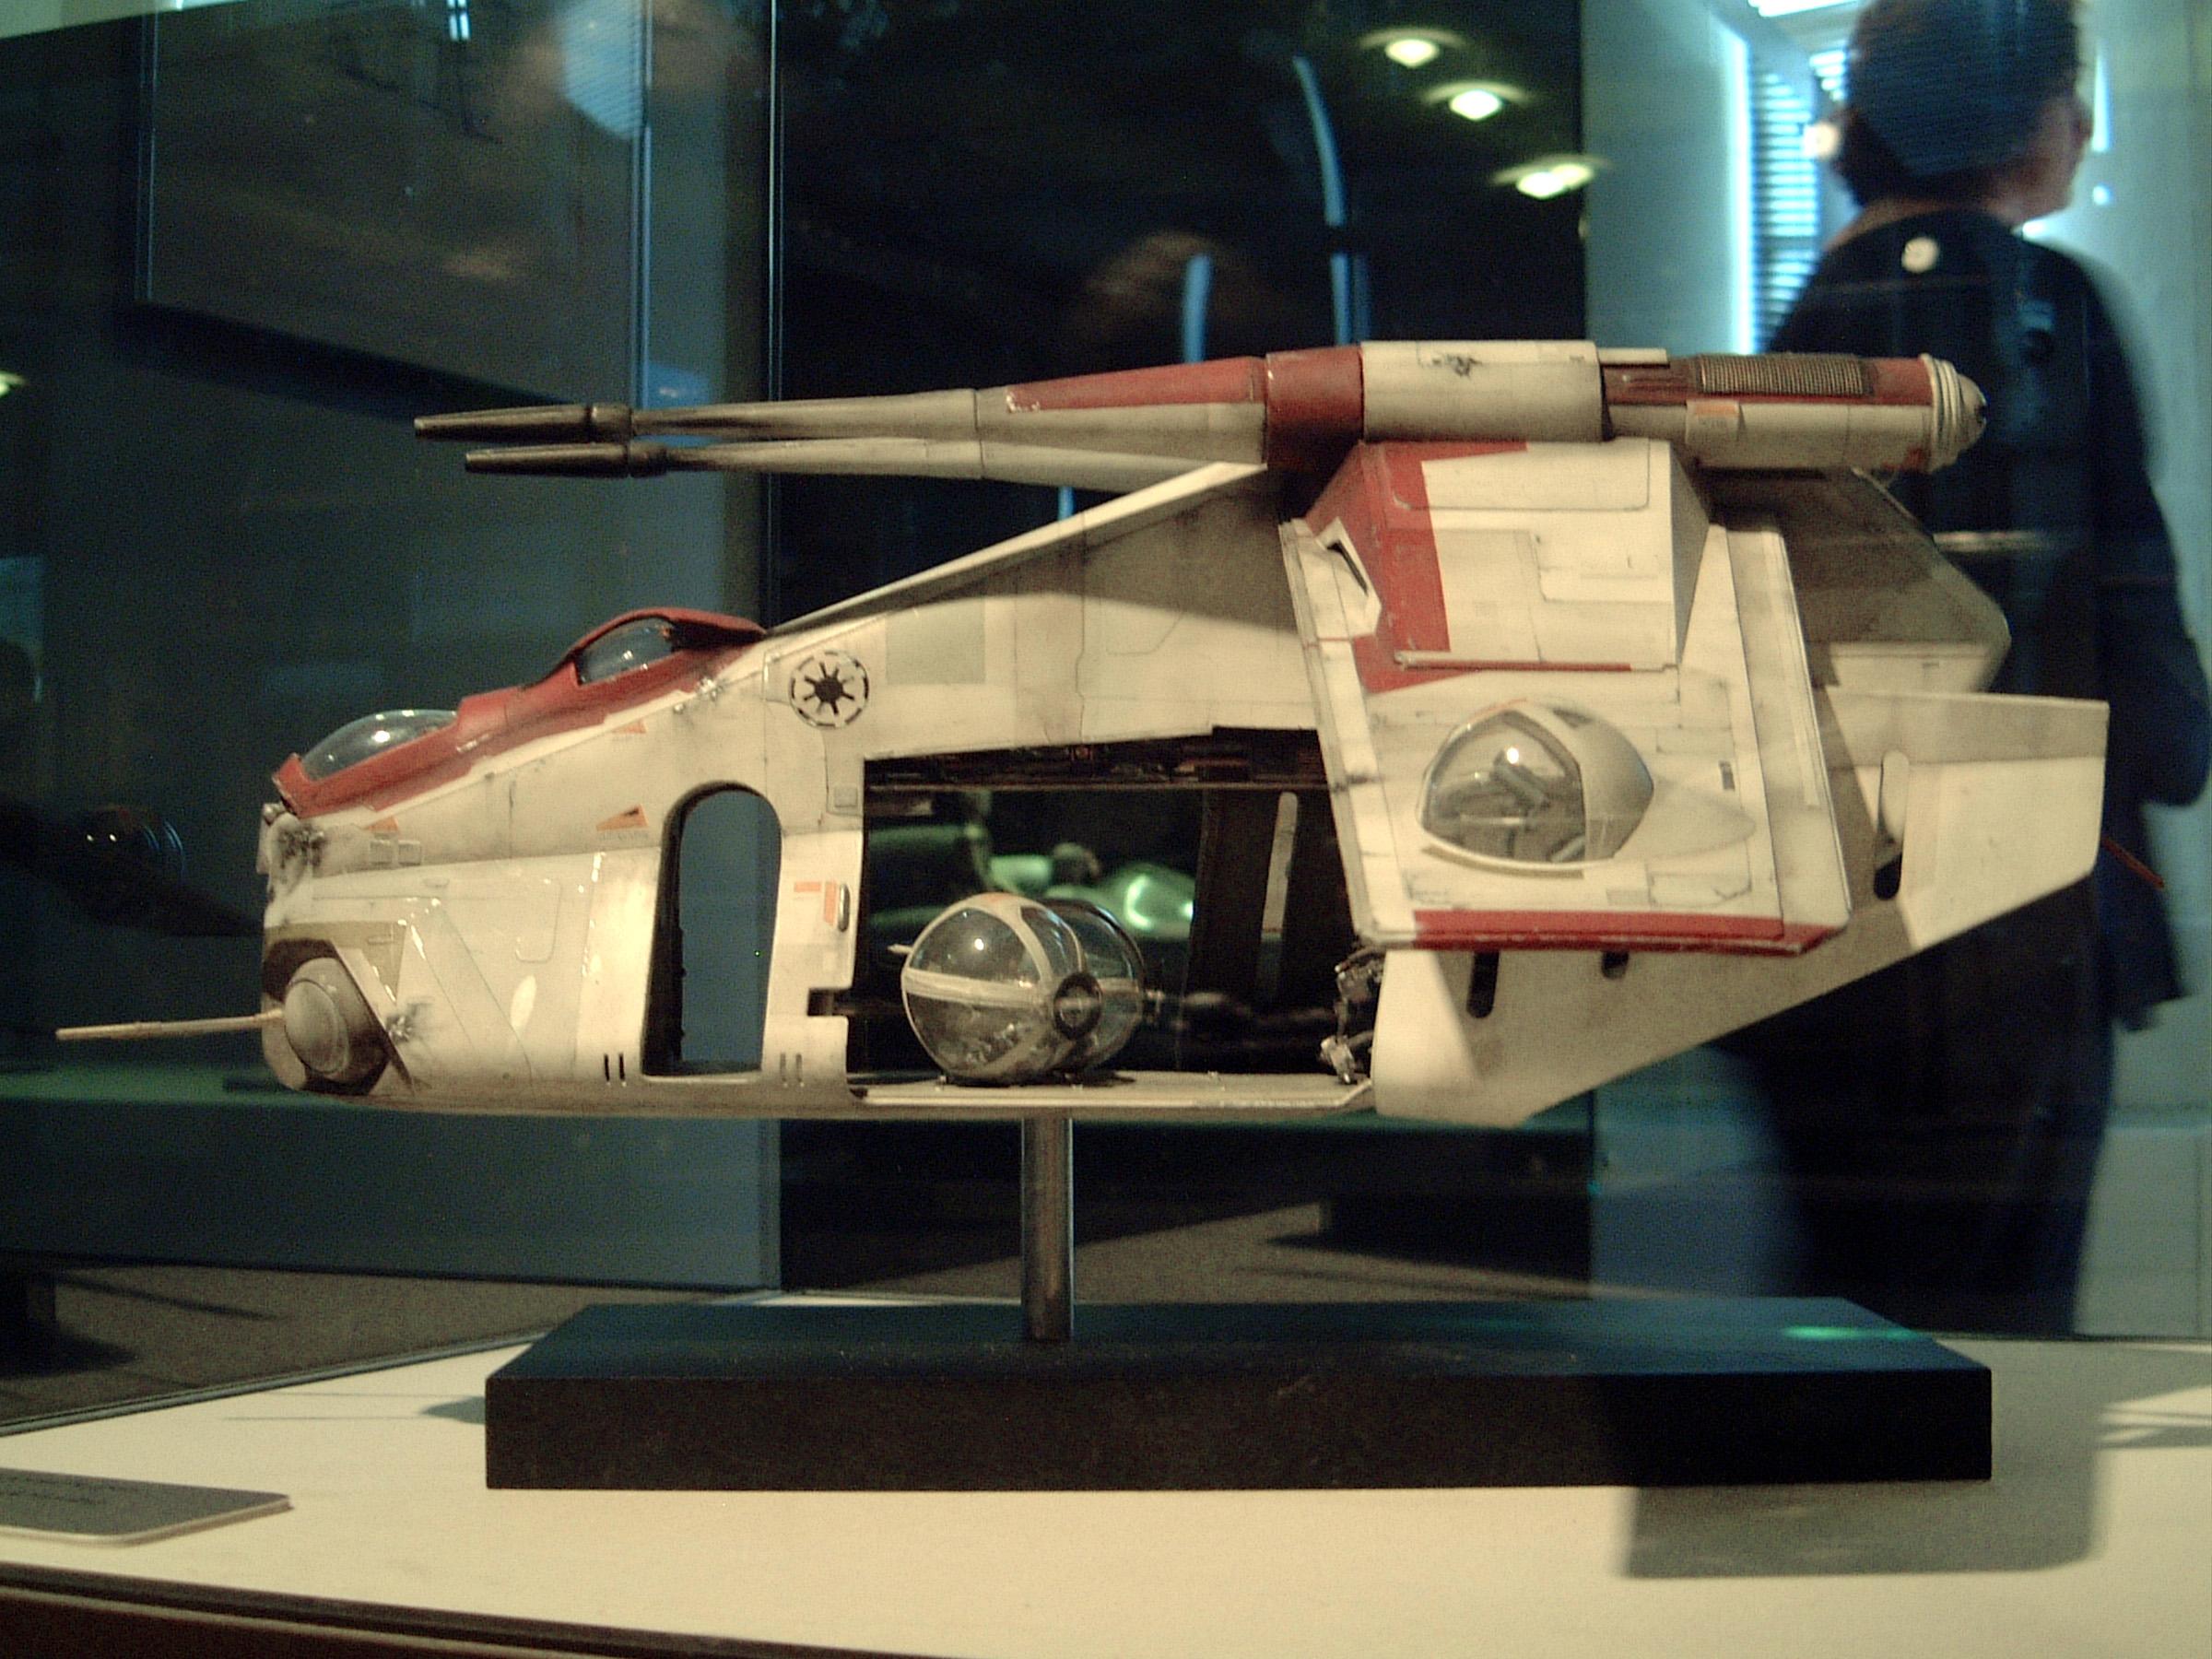 kg_republic_gunship-019-1.jpg